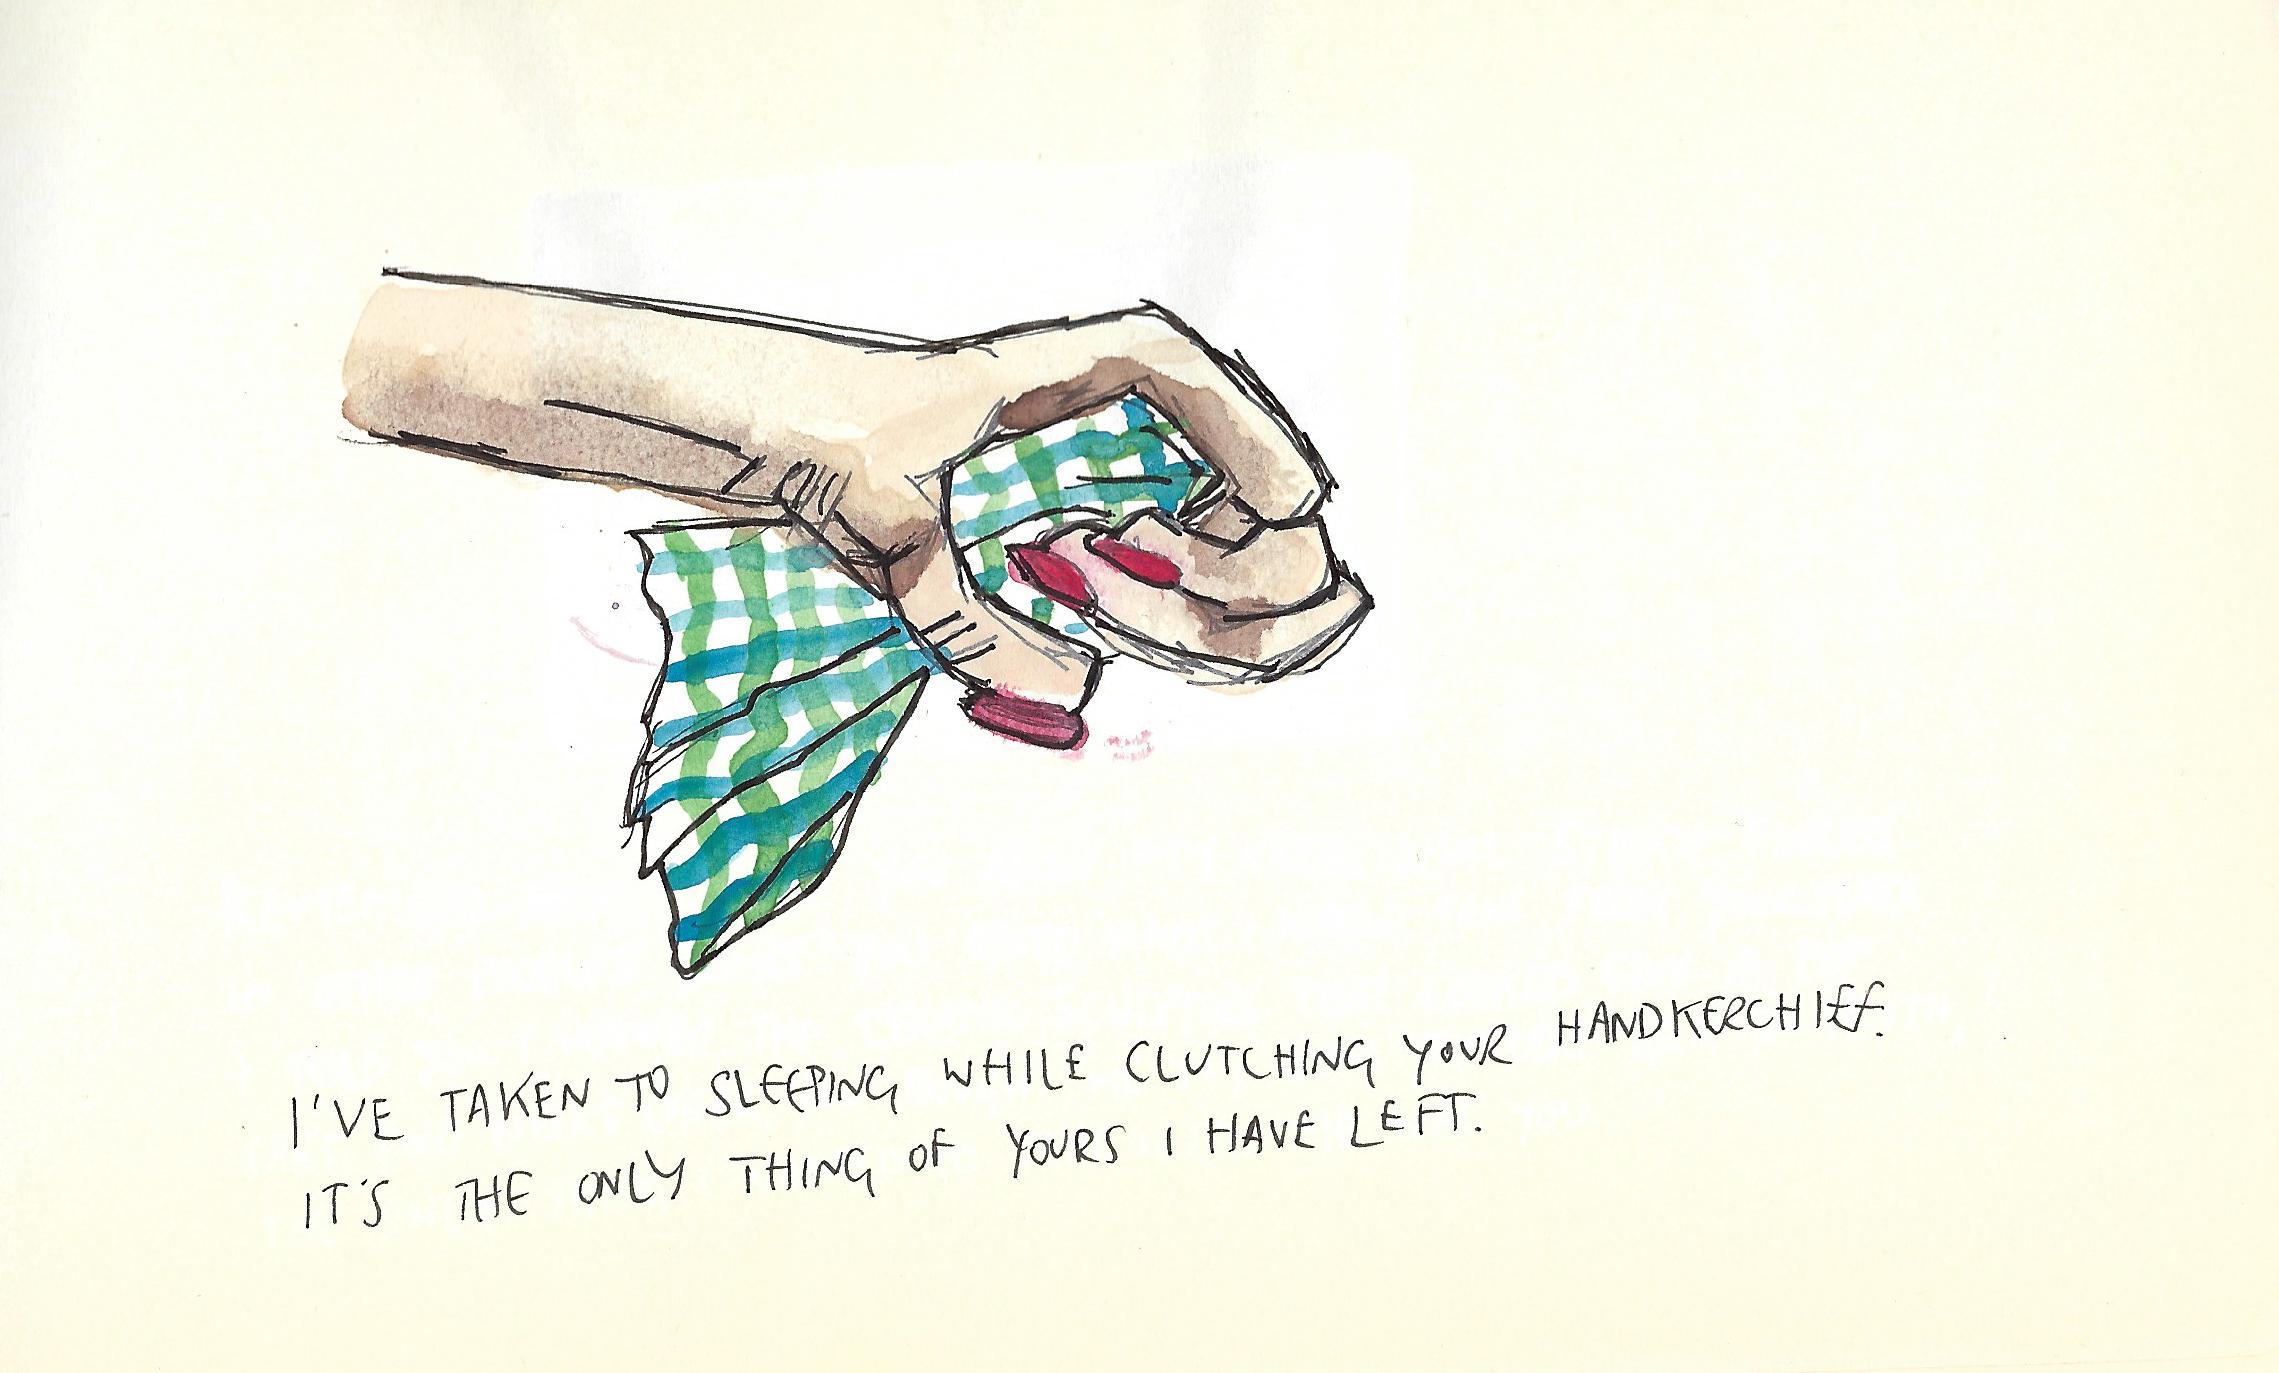 05 Handkerchief.jpeg